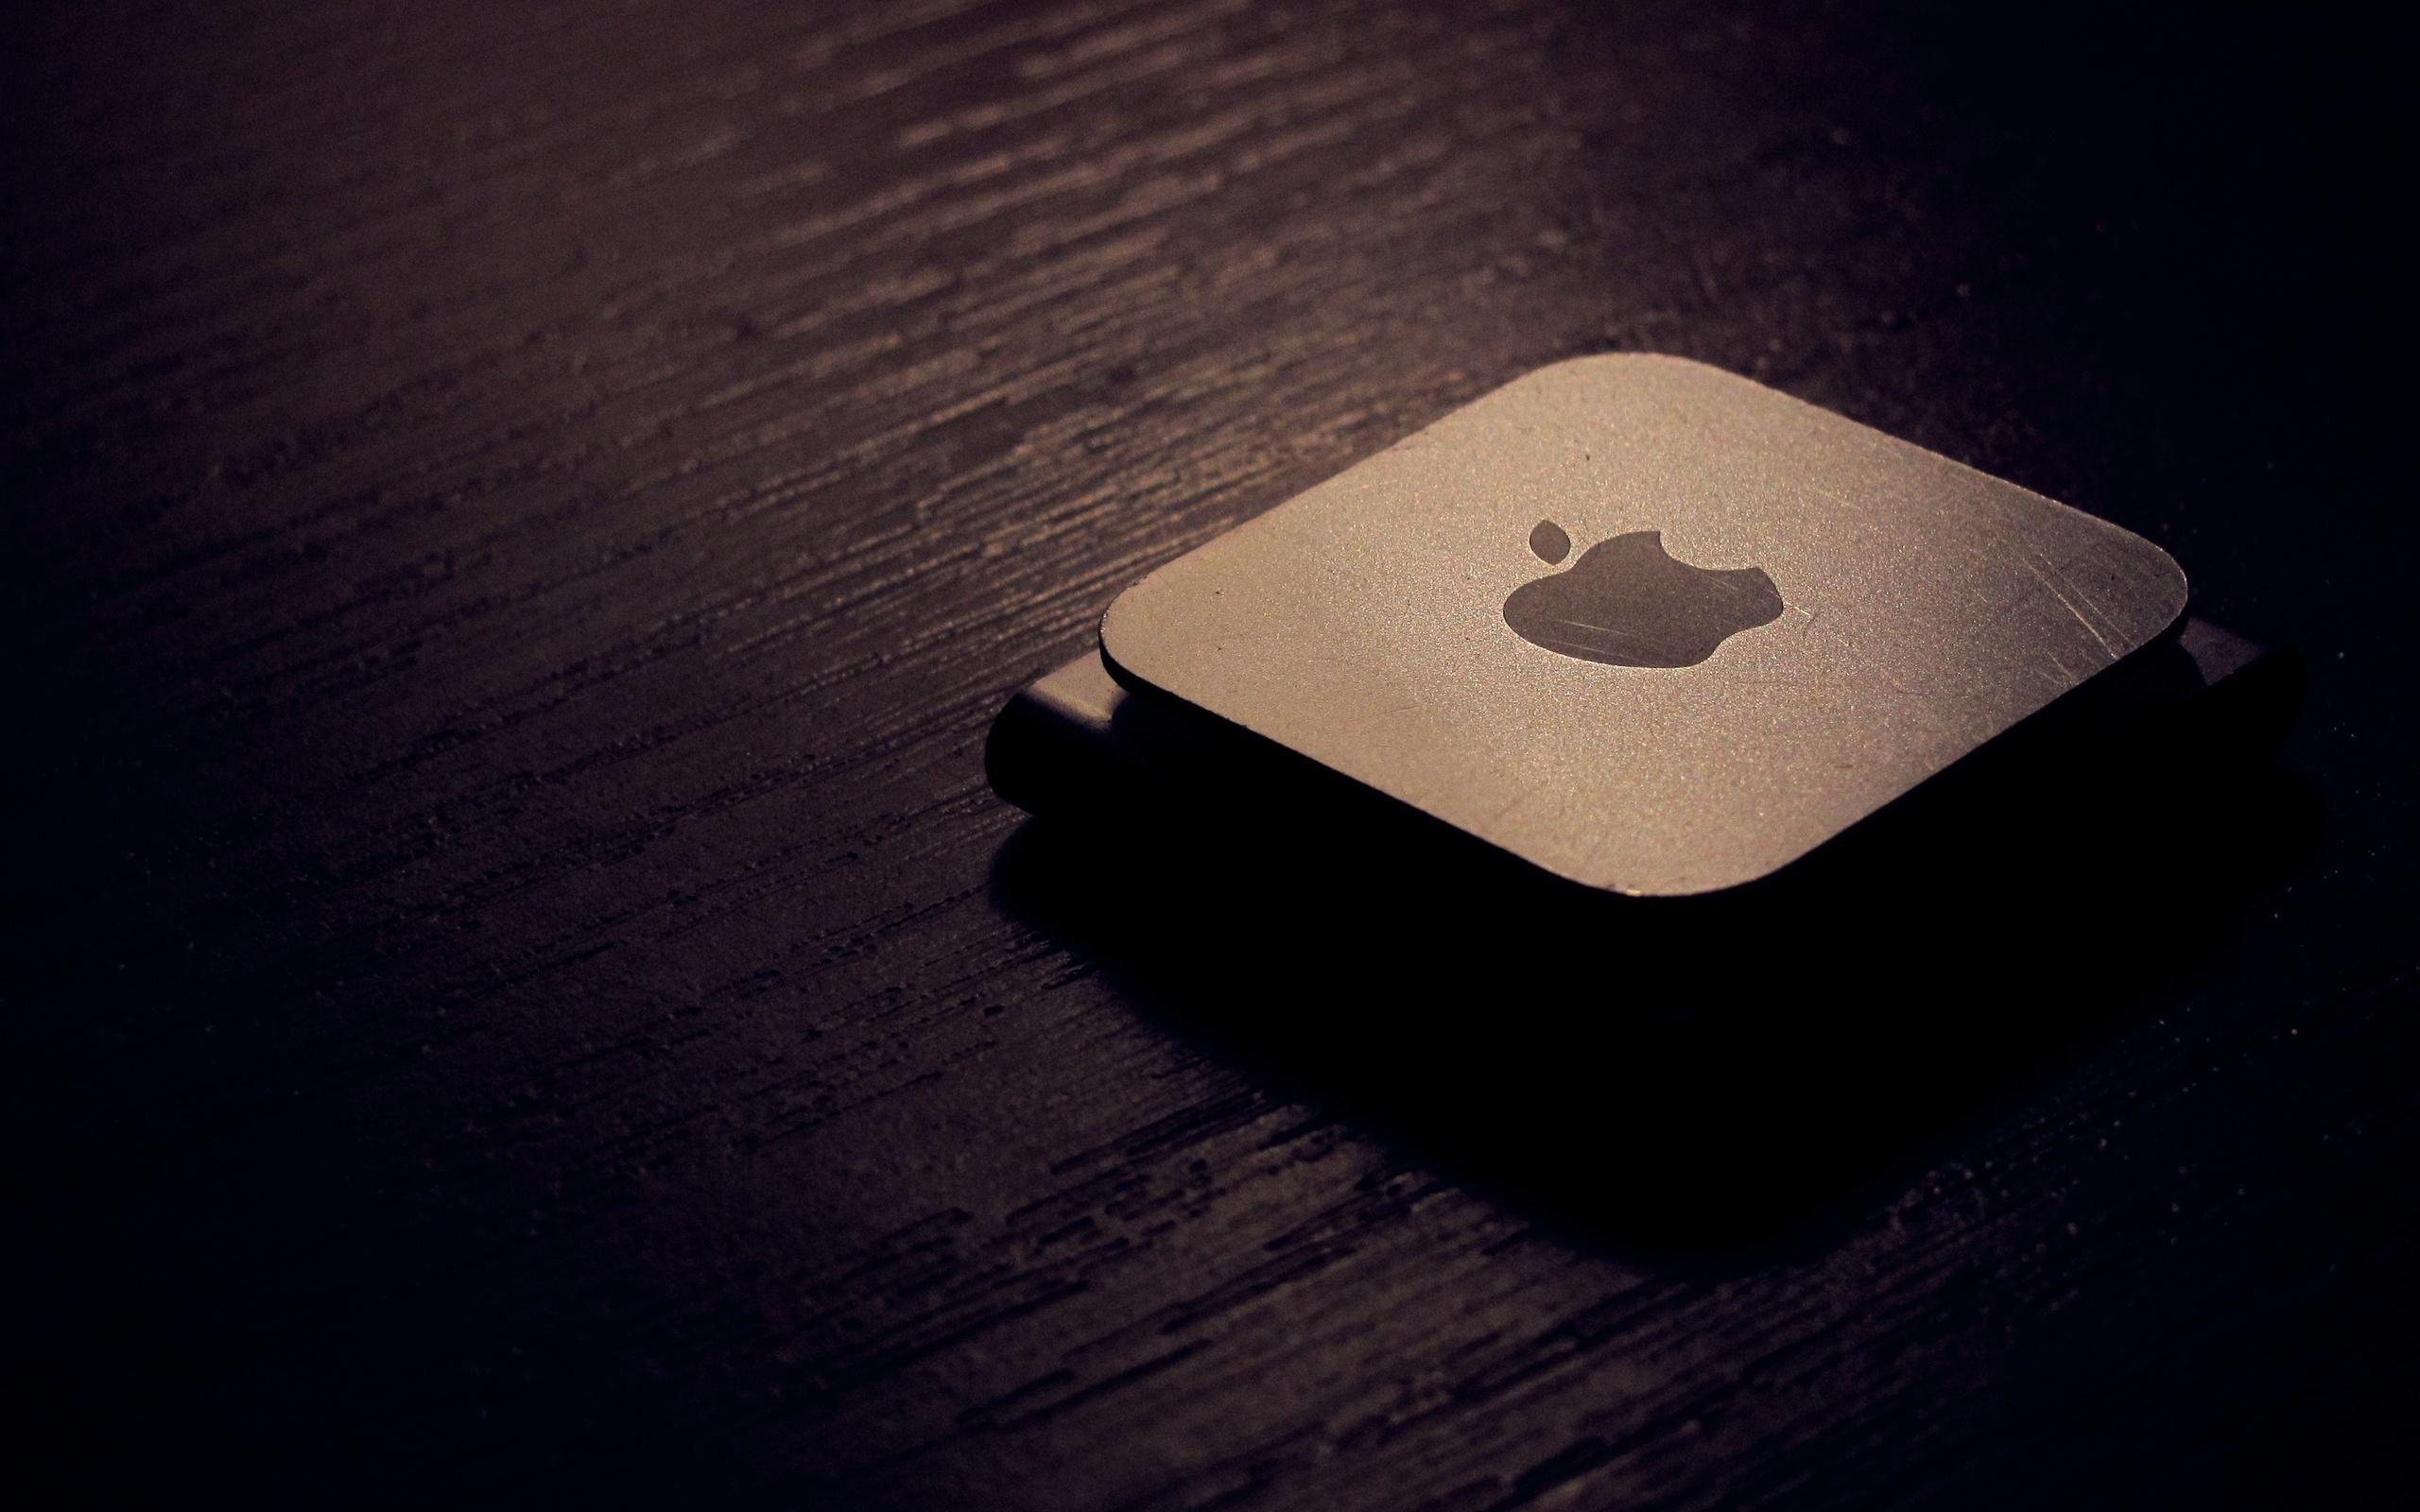 Free apple Mac Wallpapers, iMac Wallpapers, Retina MacBook Pro